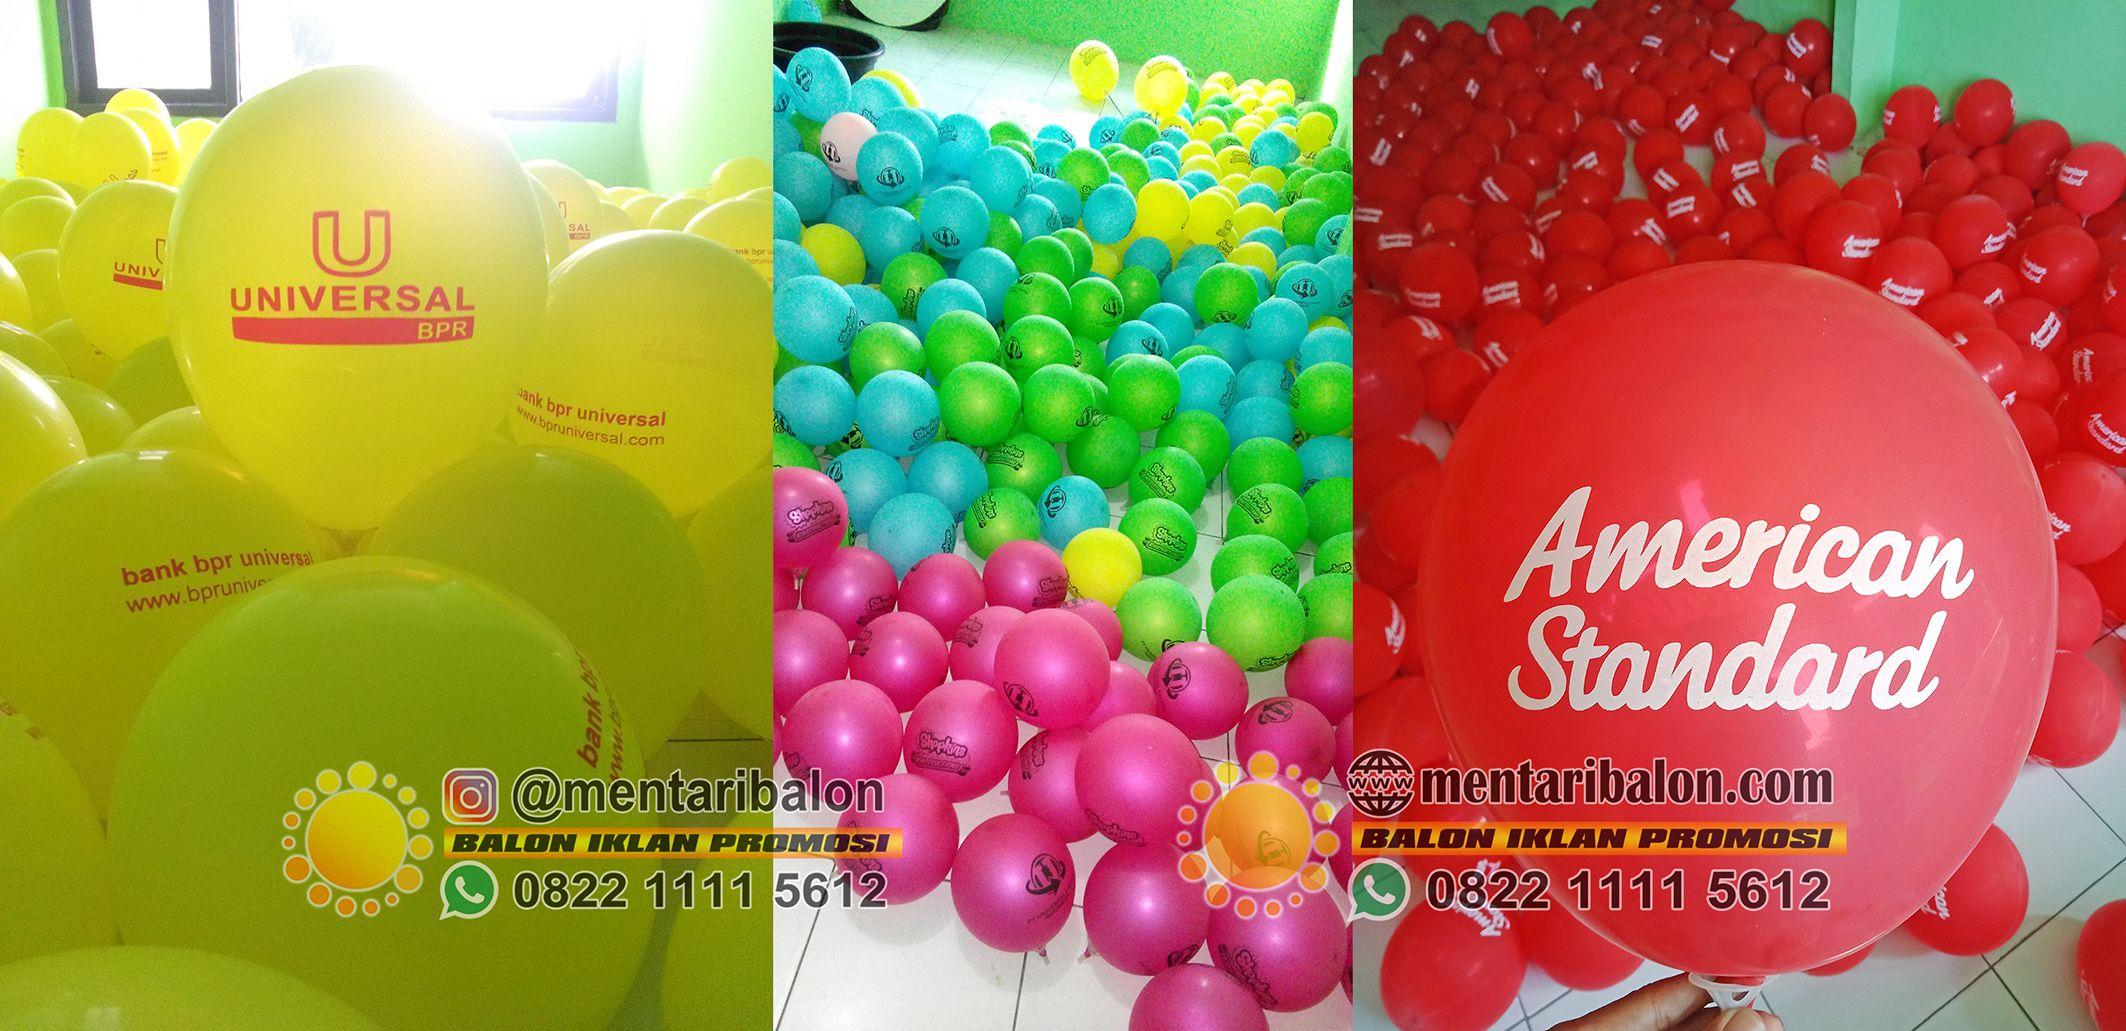 balon sablon promosi